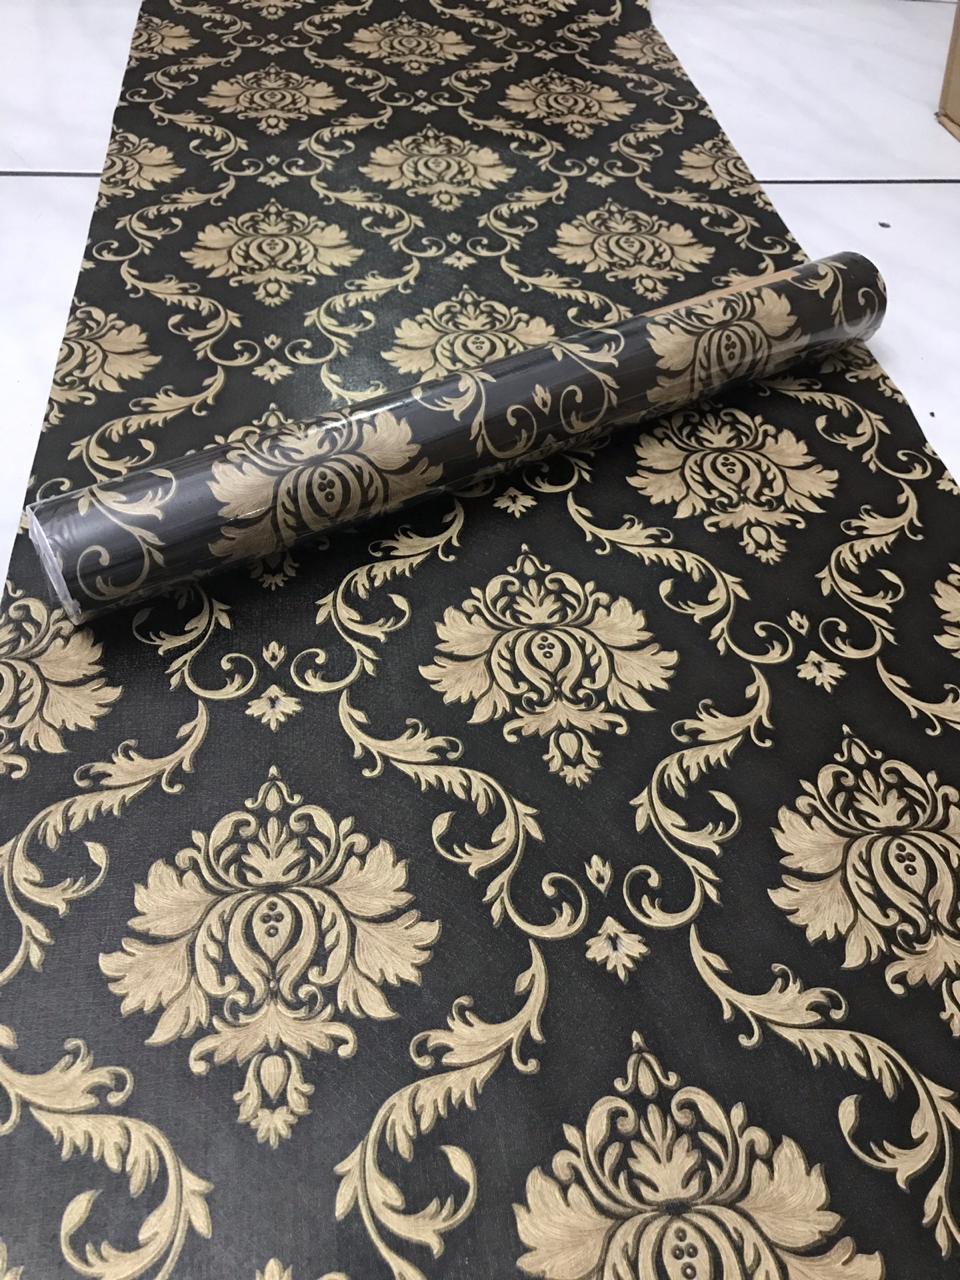 Wallpaper Stiker Dinding Motif Dan Karakter Premium Quality Size 45cm X 10M Batik Gold Dasar Hitam